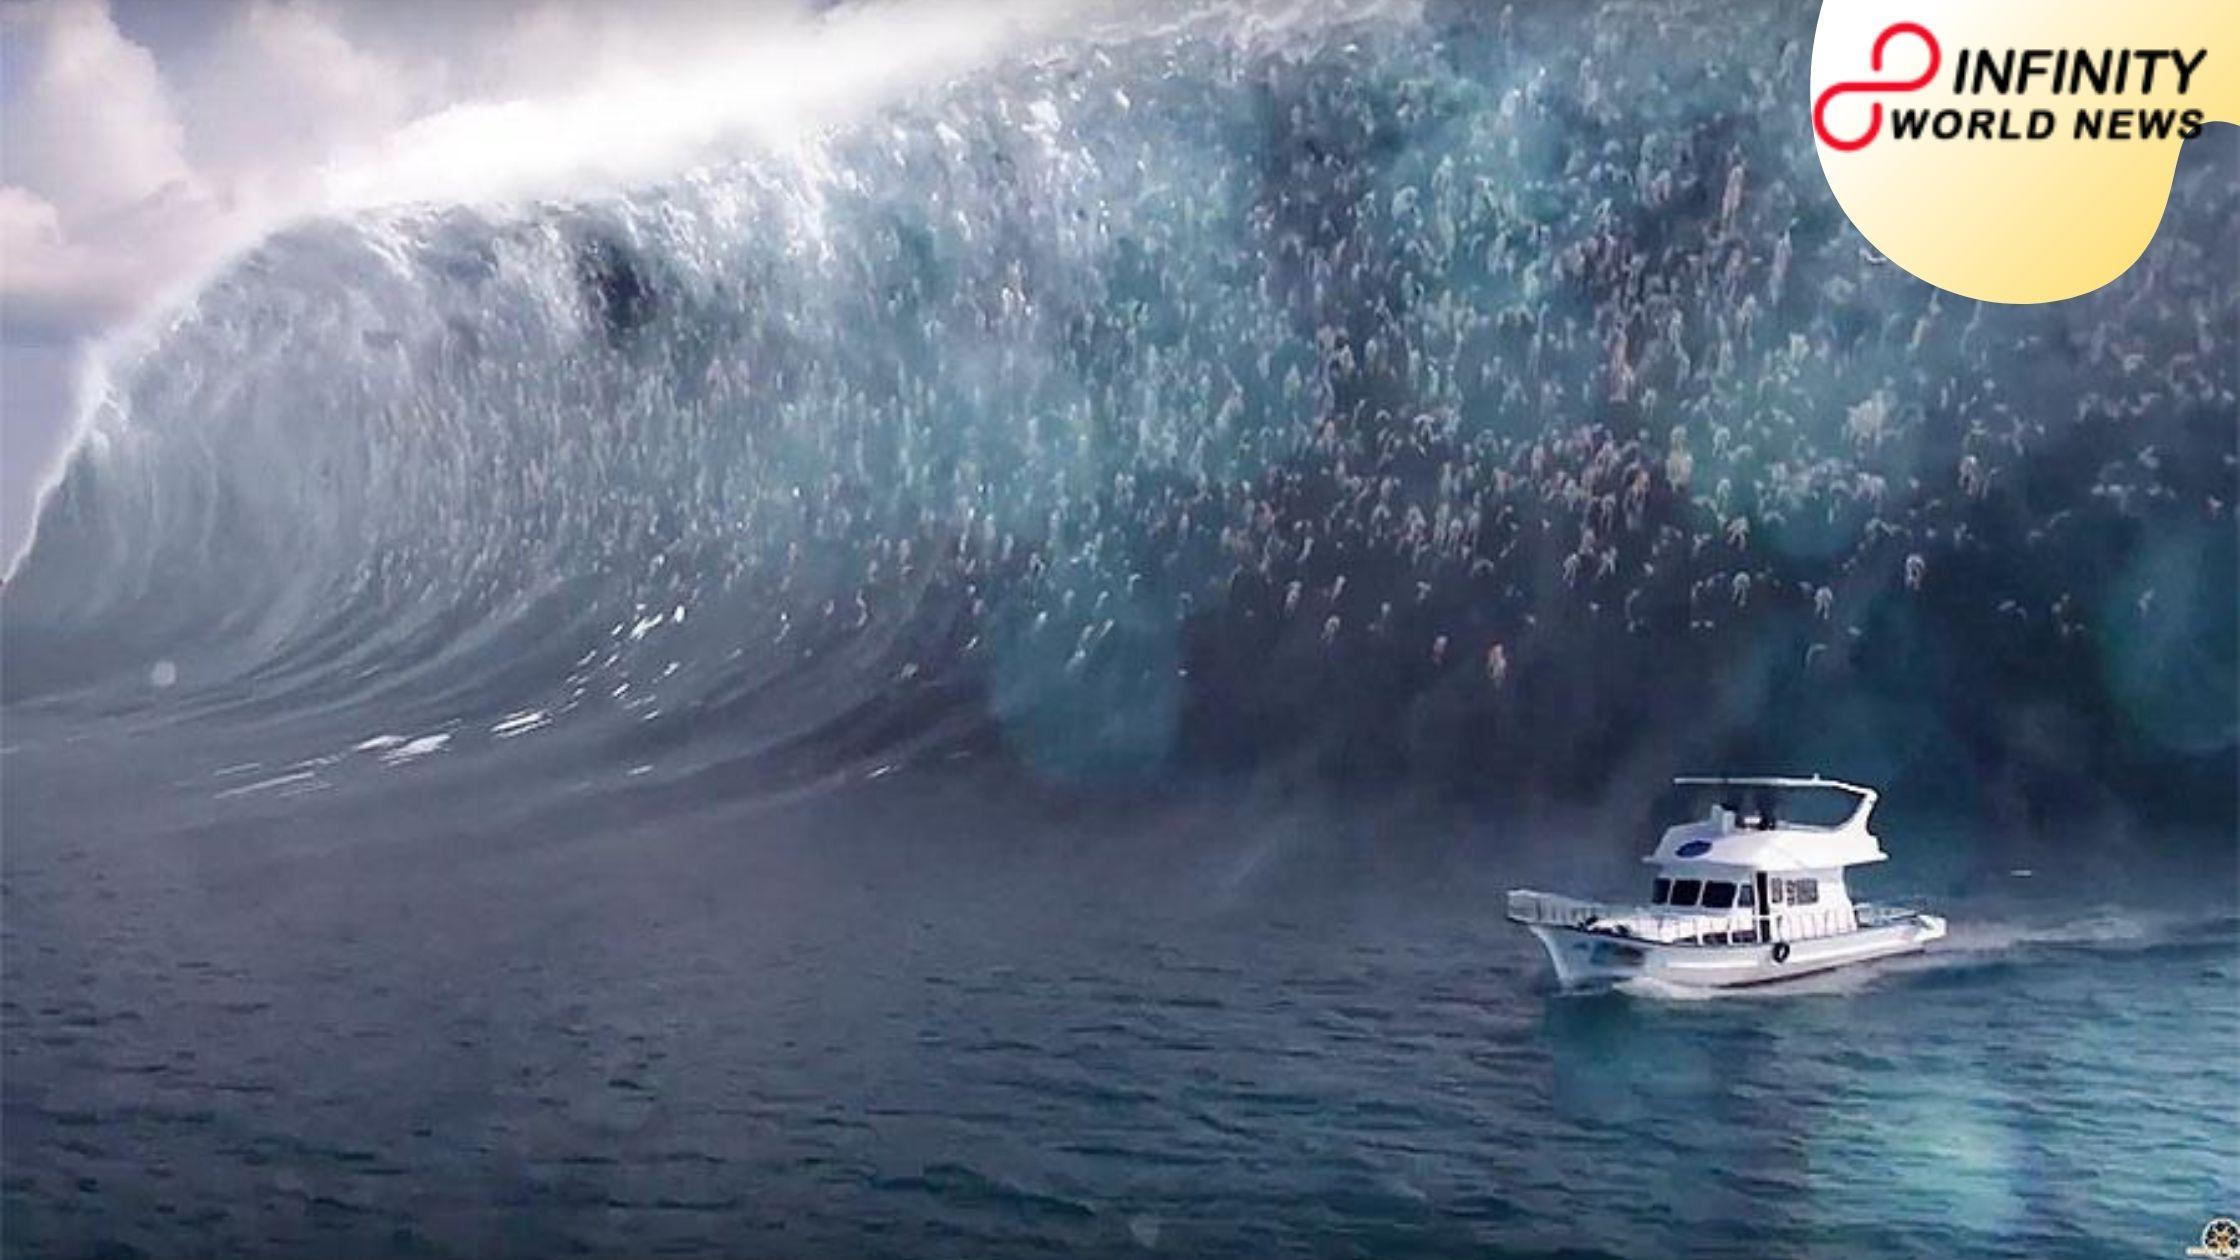 Tidal wave versus meteotsunami_ What to know